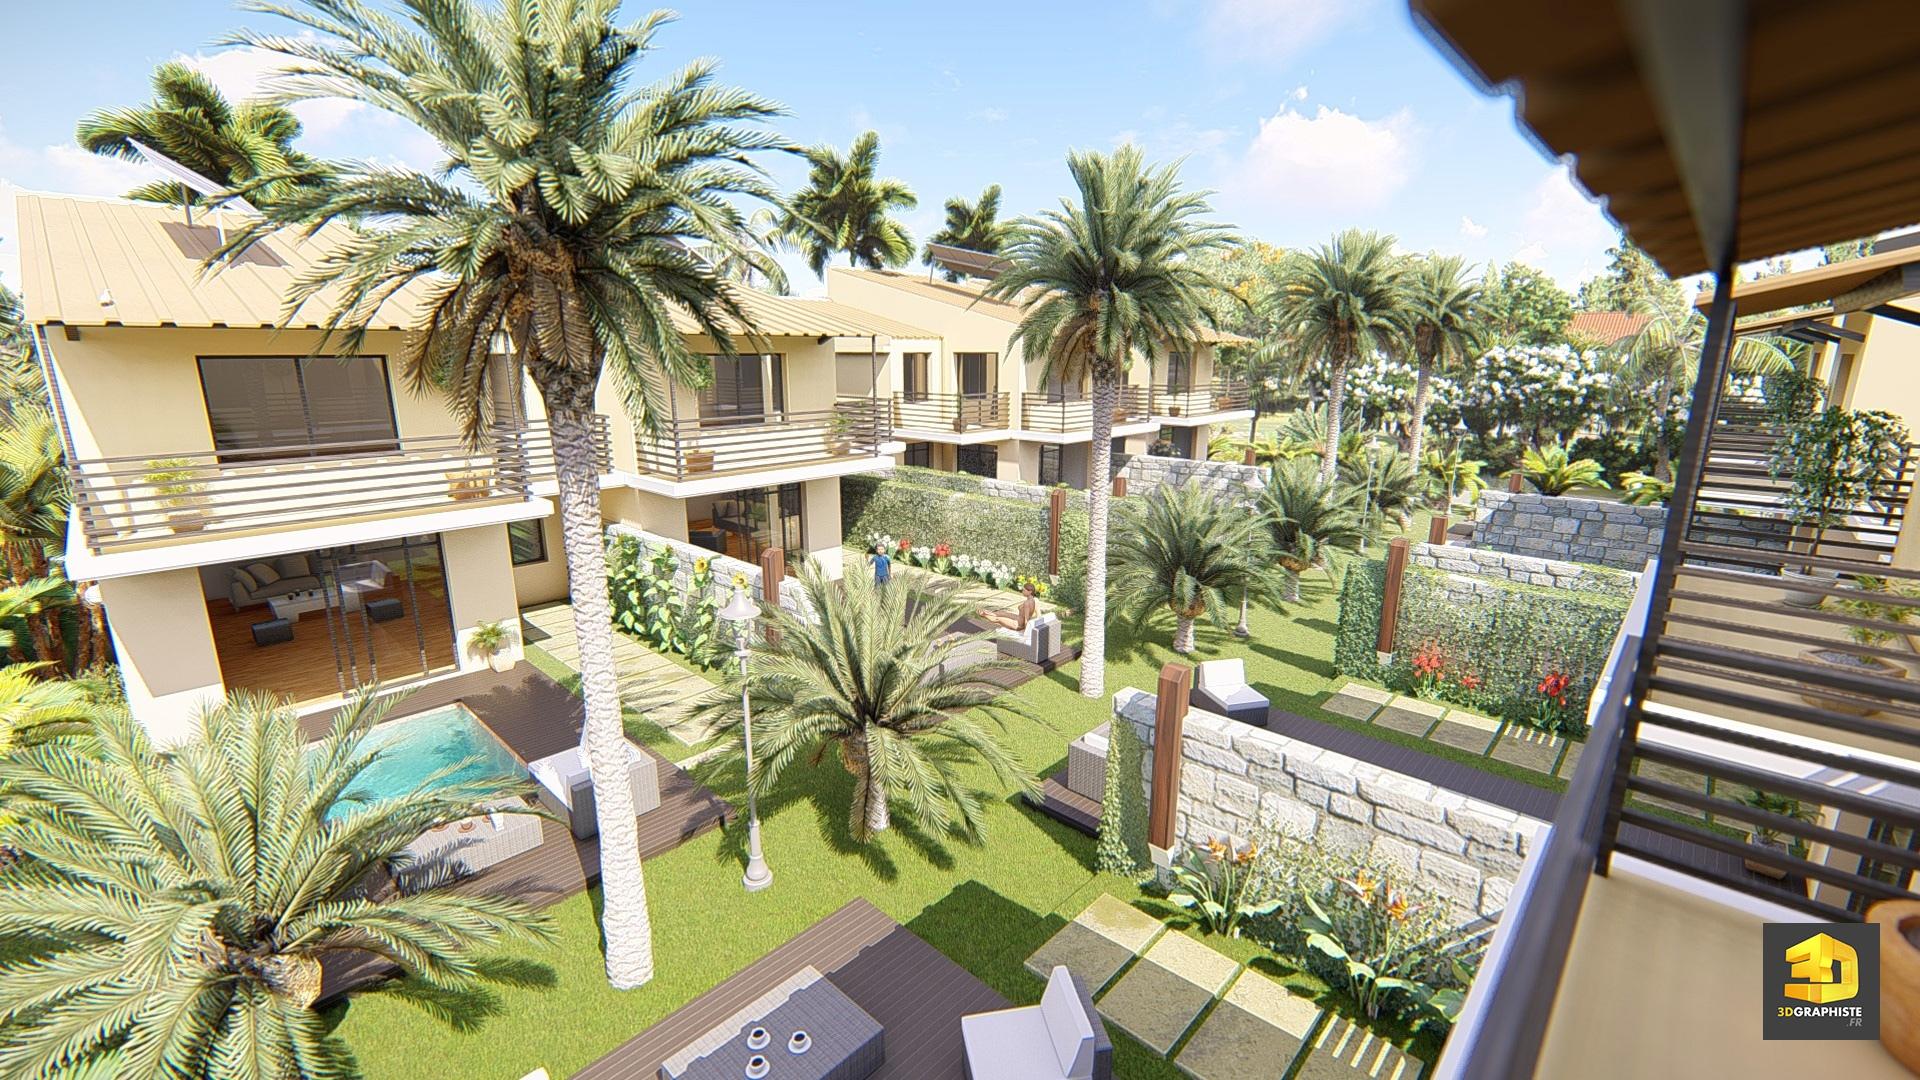 graphiste 3d villas tropicales 3dgraphiste fr. Black Bedroom Furniture Sets. Home Design Ideas